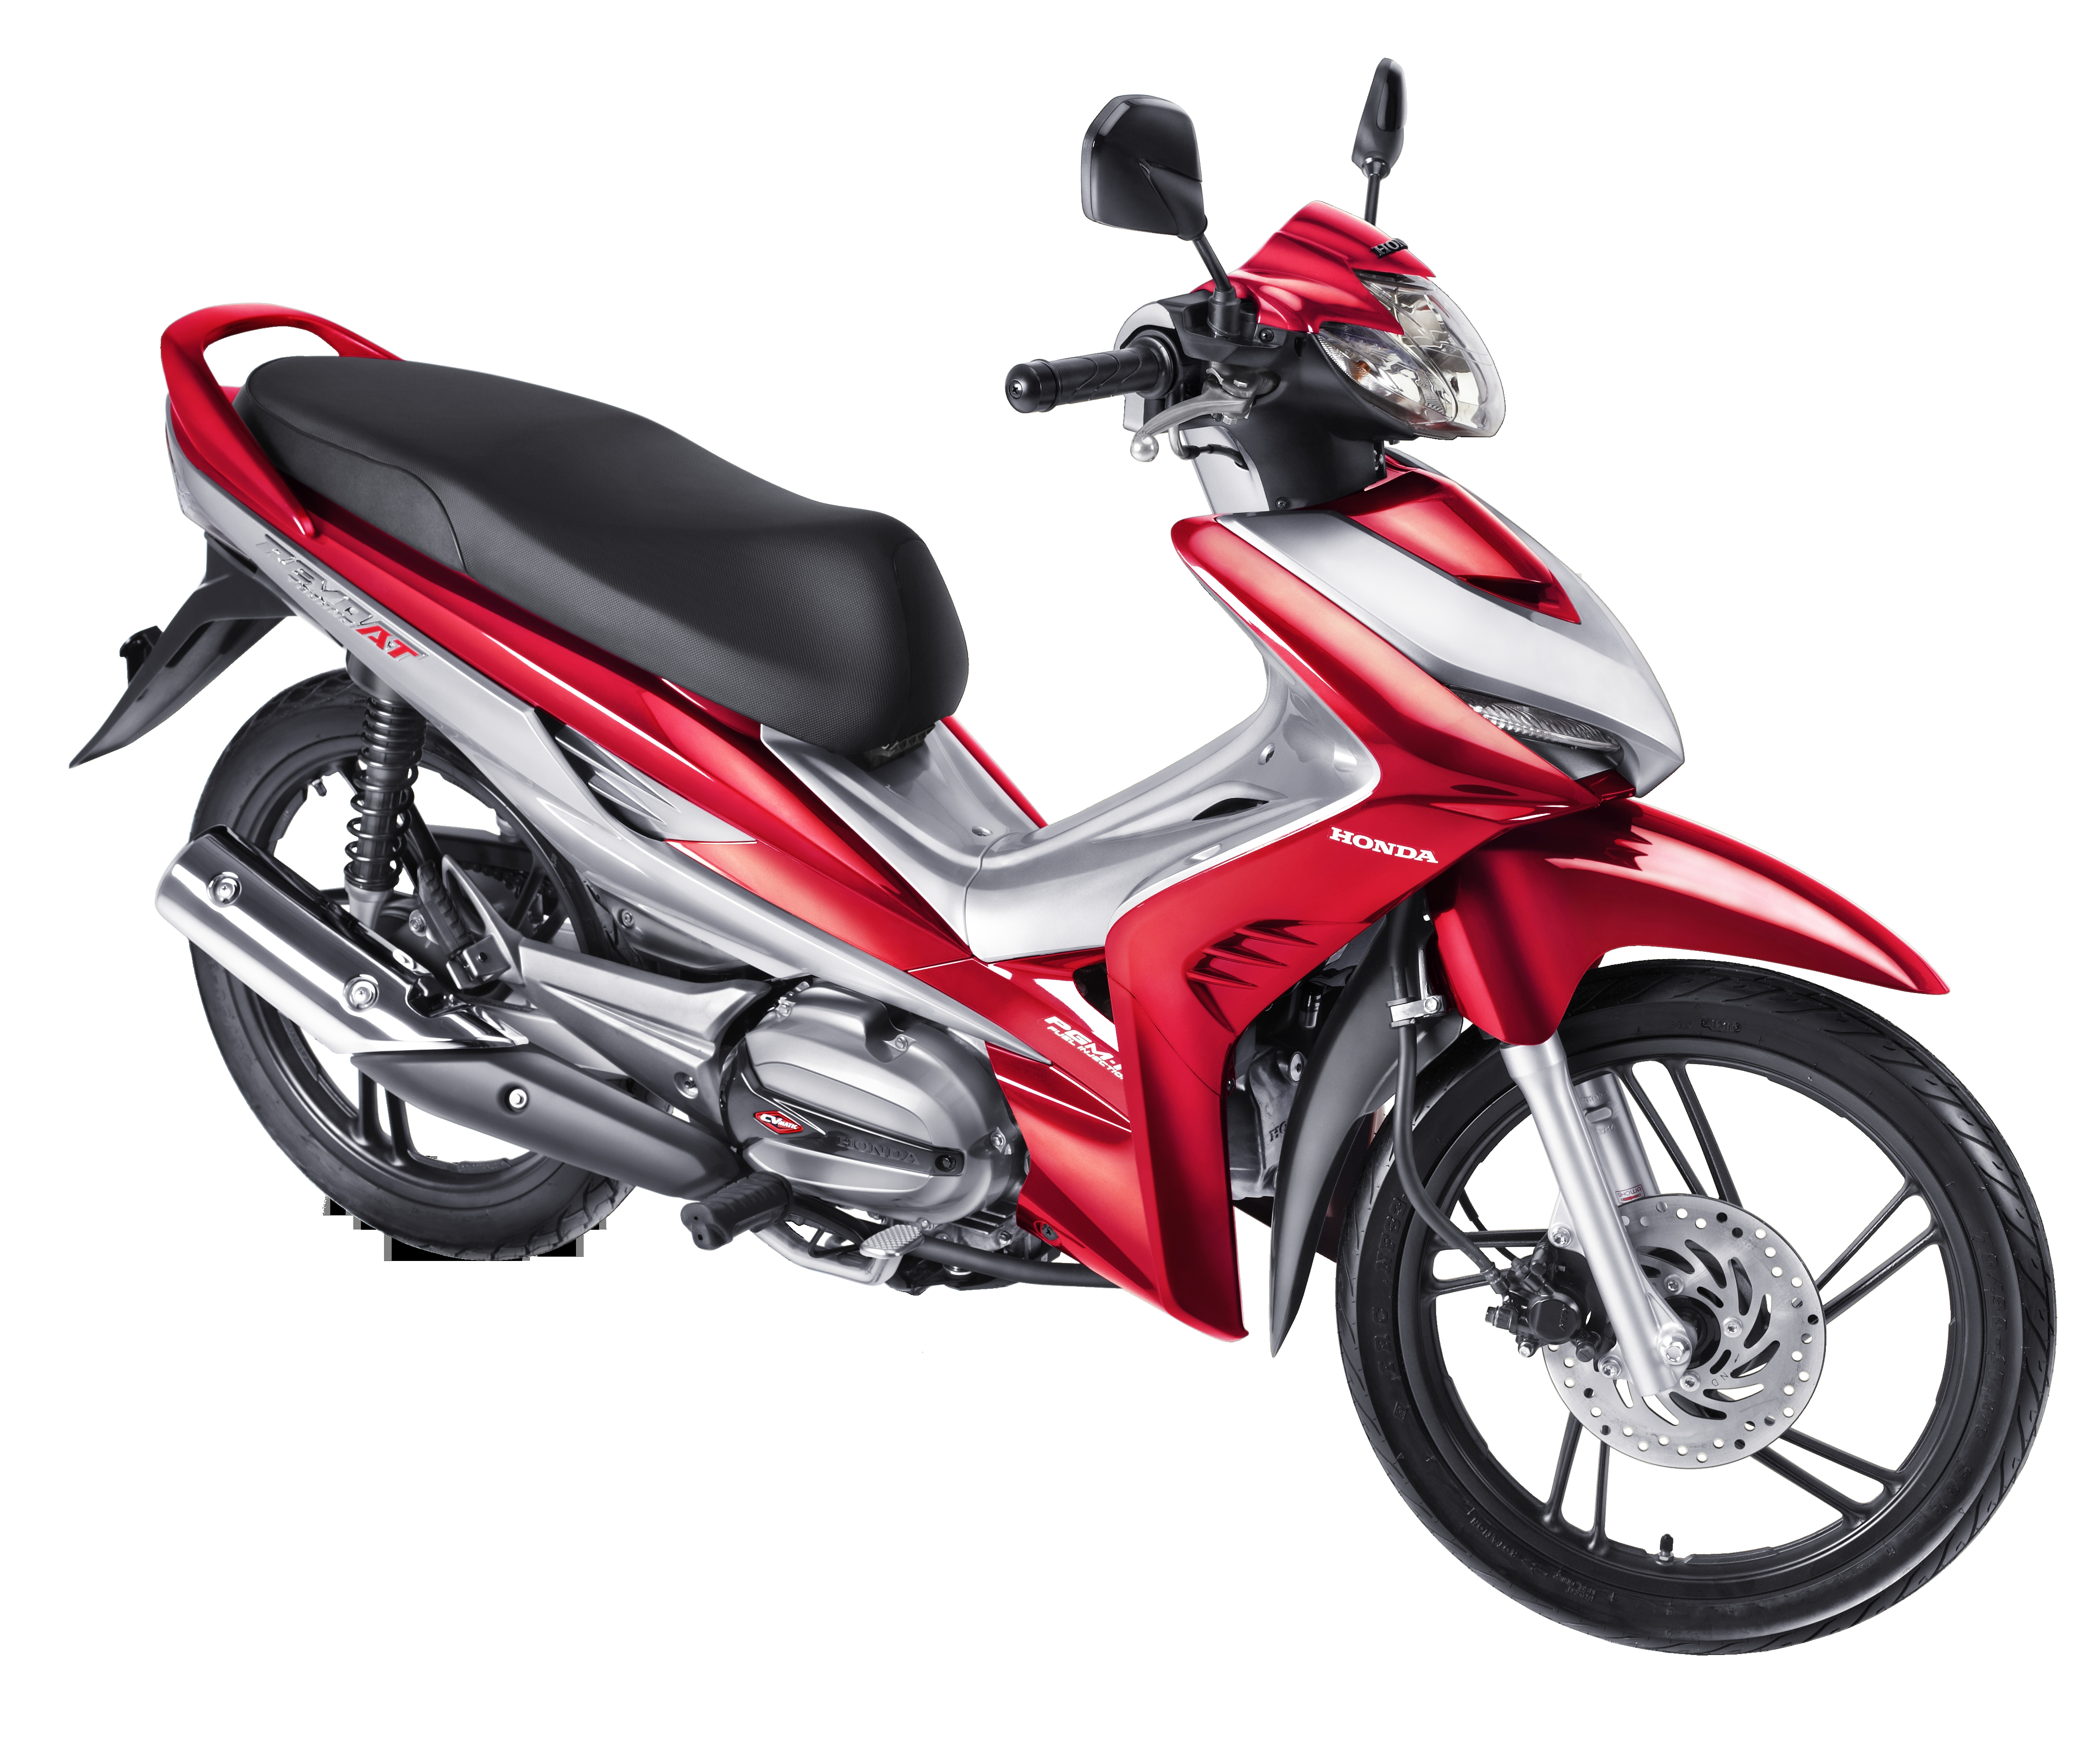 Sepeda Motor 110 CC Masih Favorit Edo Rusyanto's Traffic